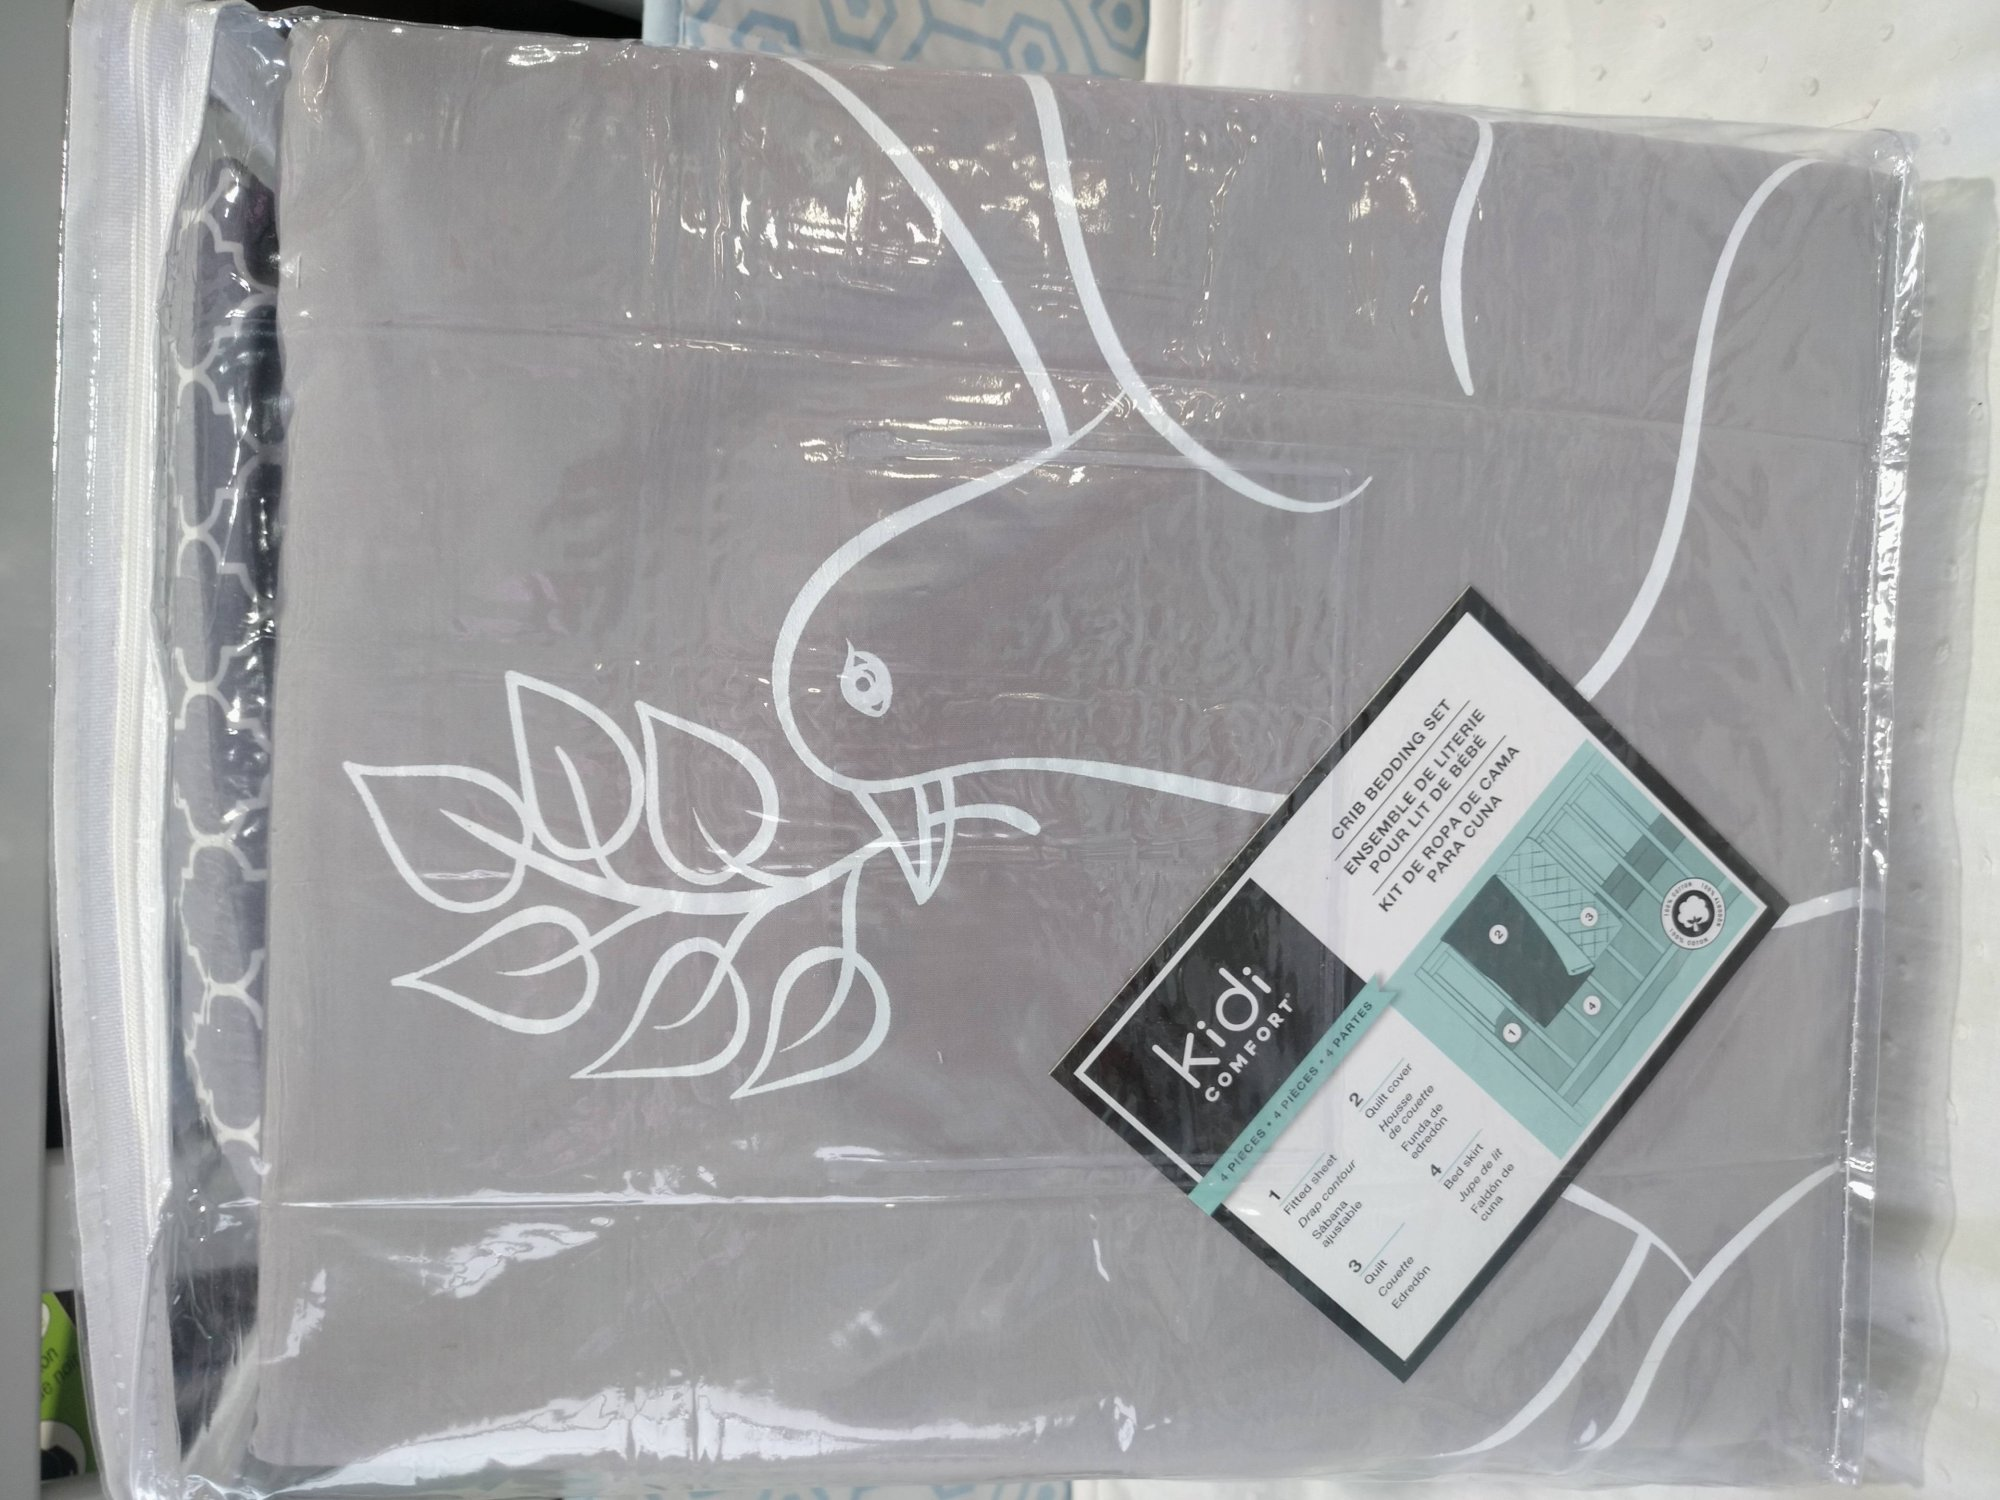 Kidicomfort 4 Pcs Bedding Set - Quattrofoil/Love Bird Grey